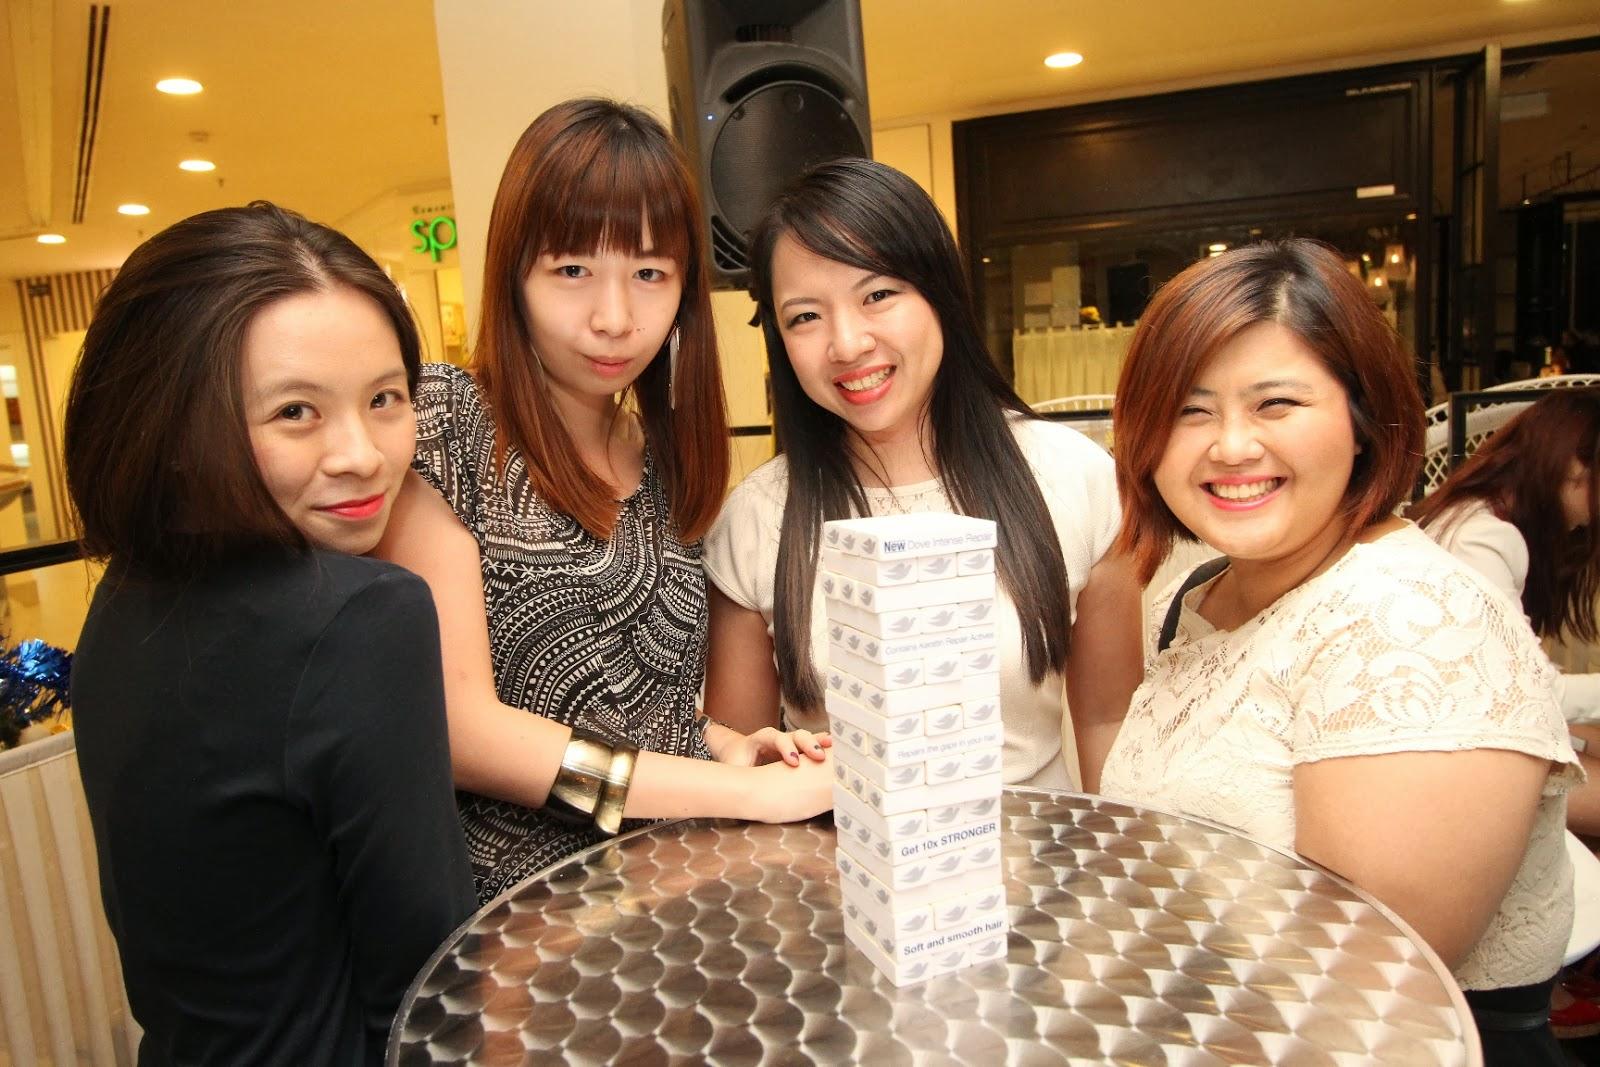 Girls playing jenga